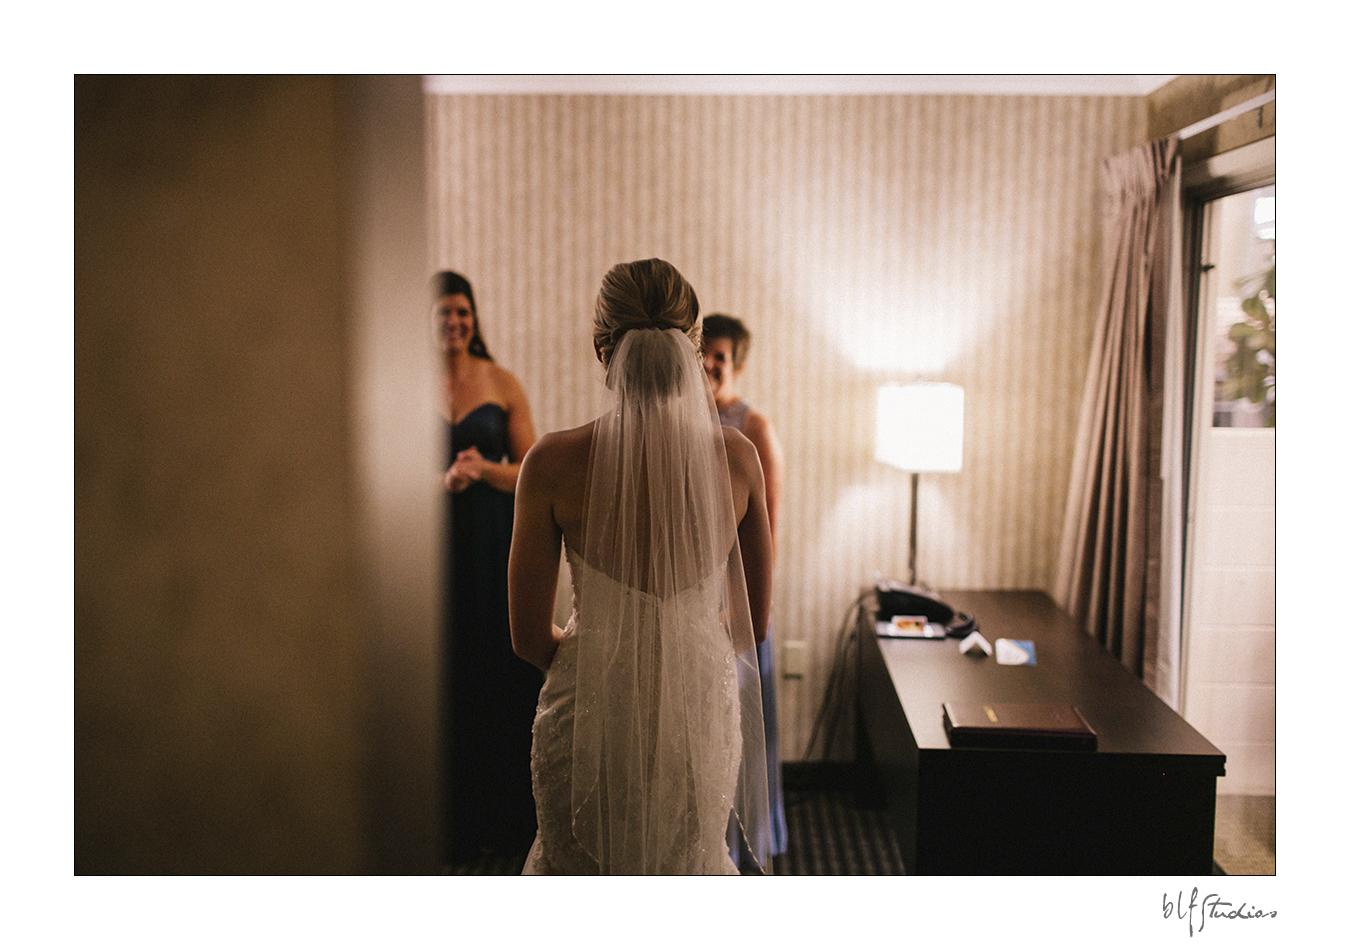 003Brandon Wedding Photographer Karla James.jpg